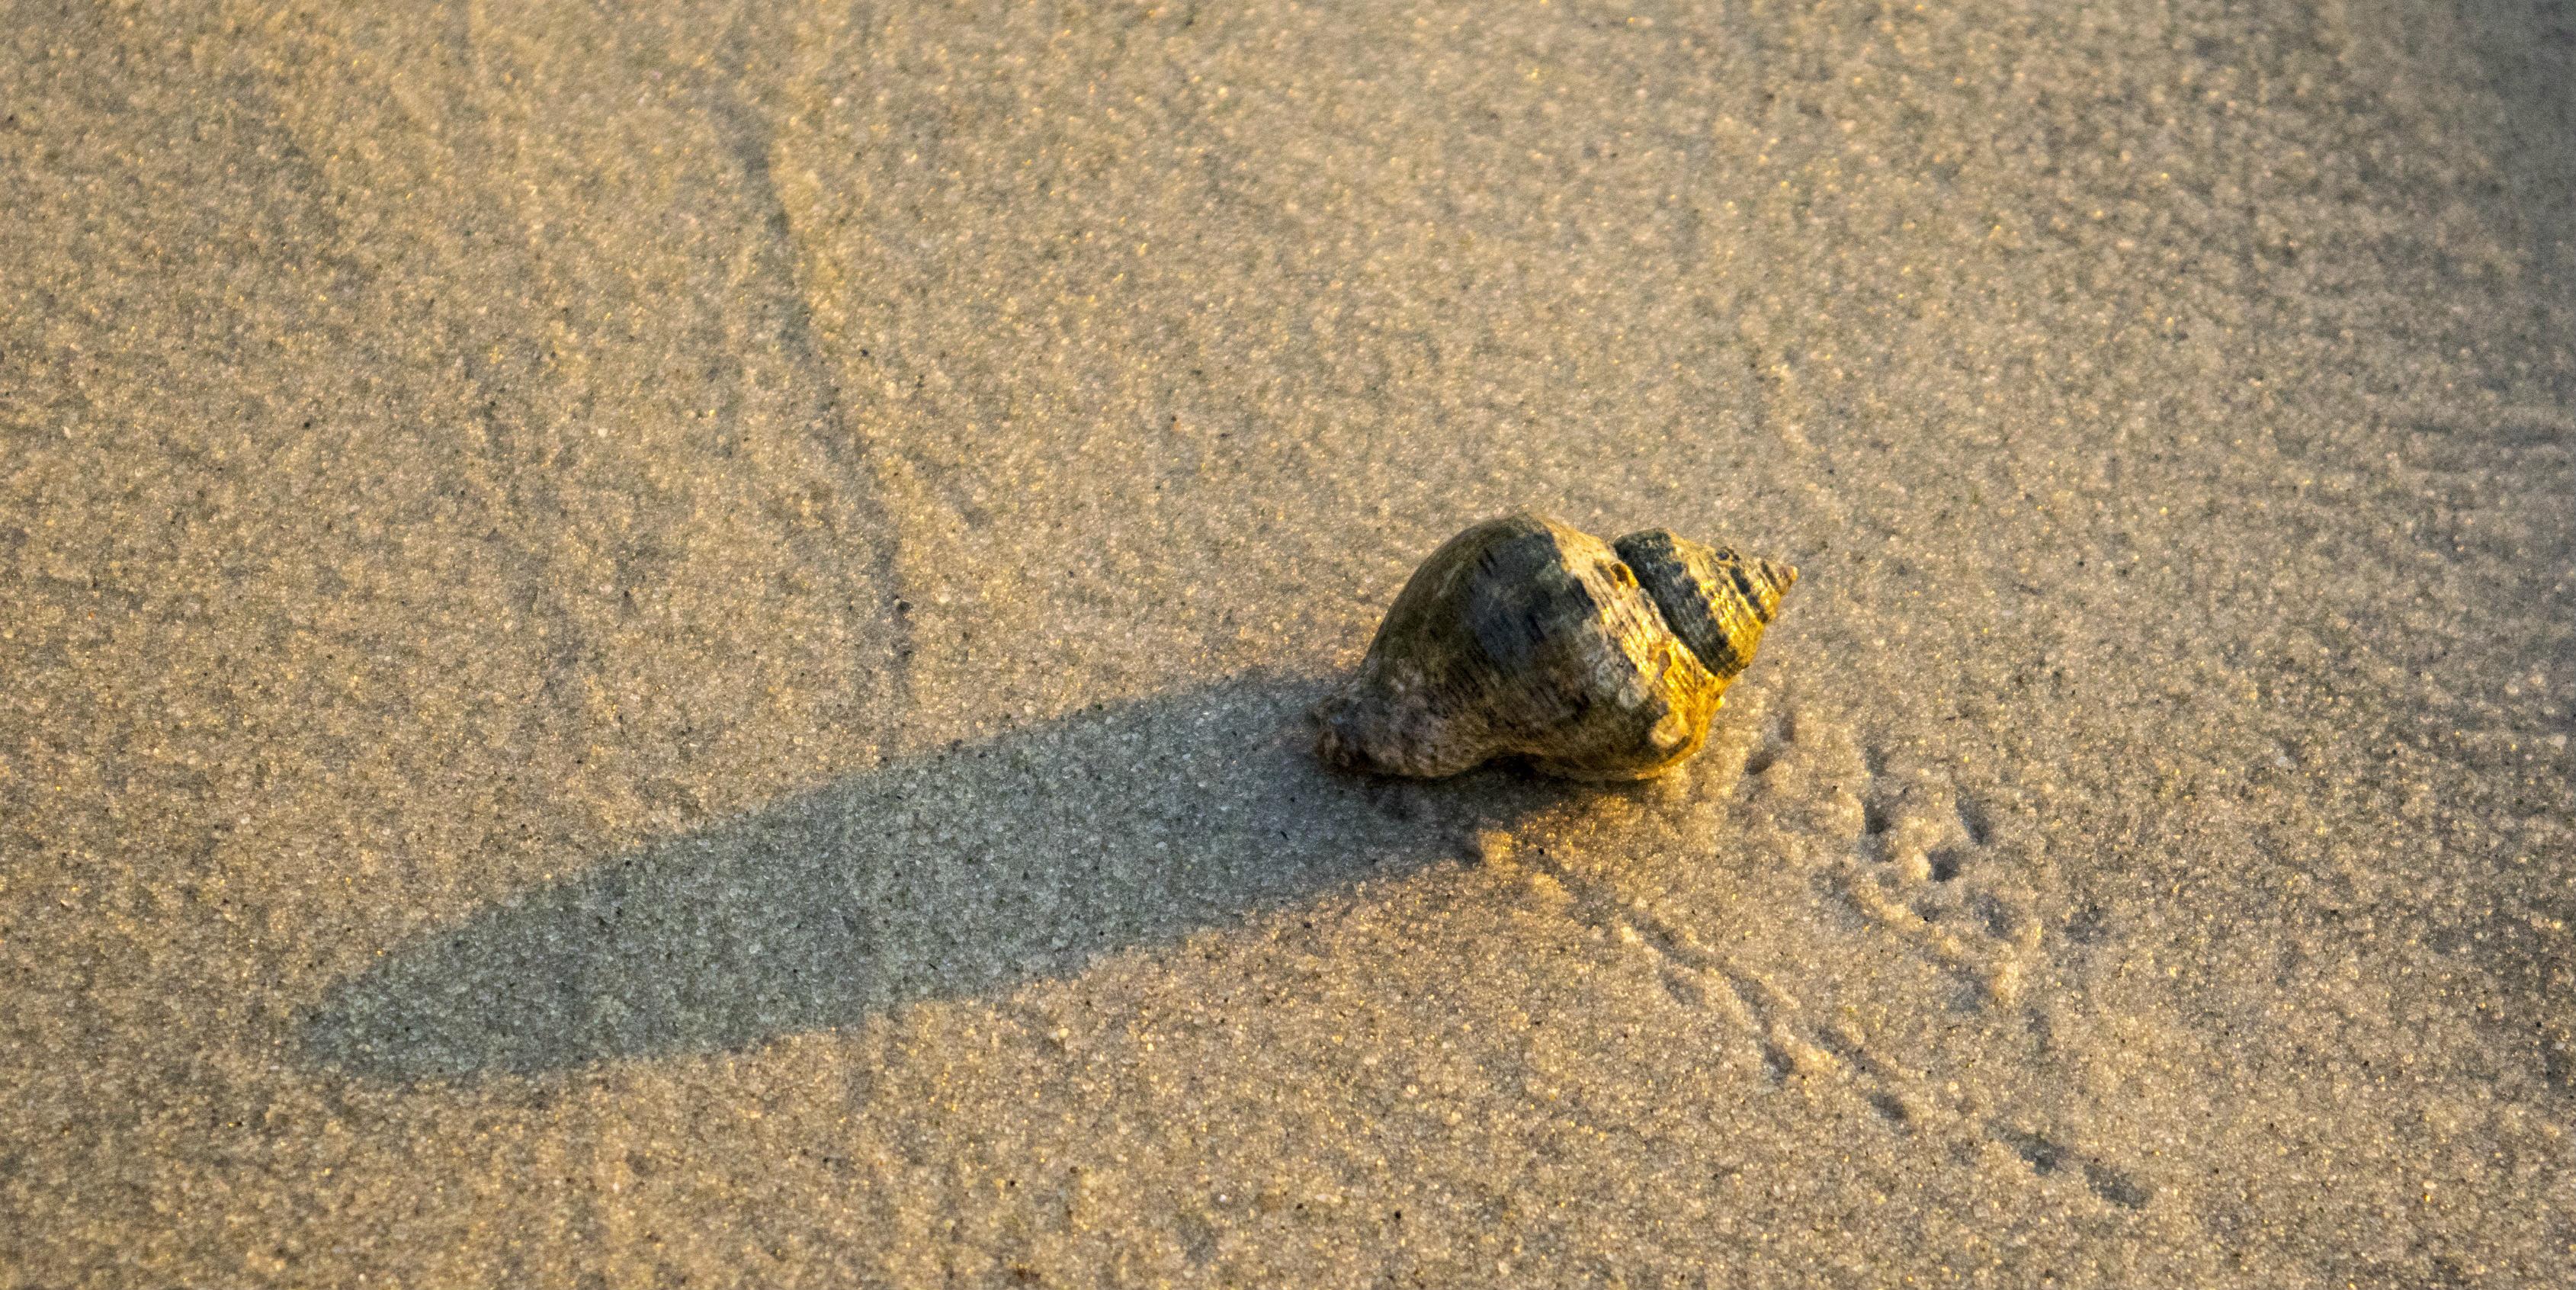 A hermit crab crawls across a beach | responsible travel